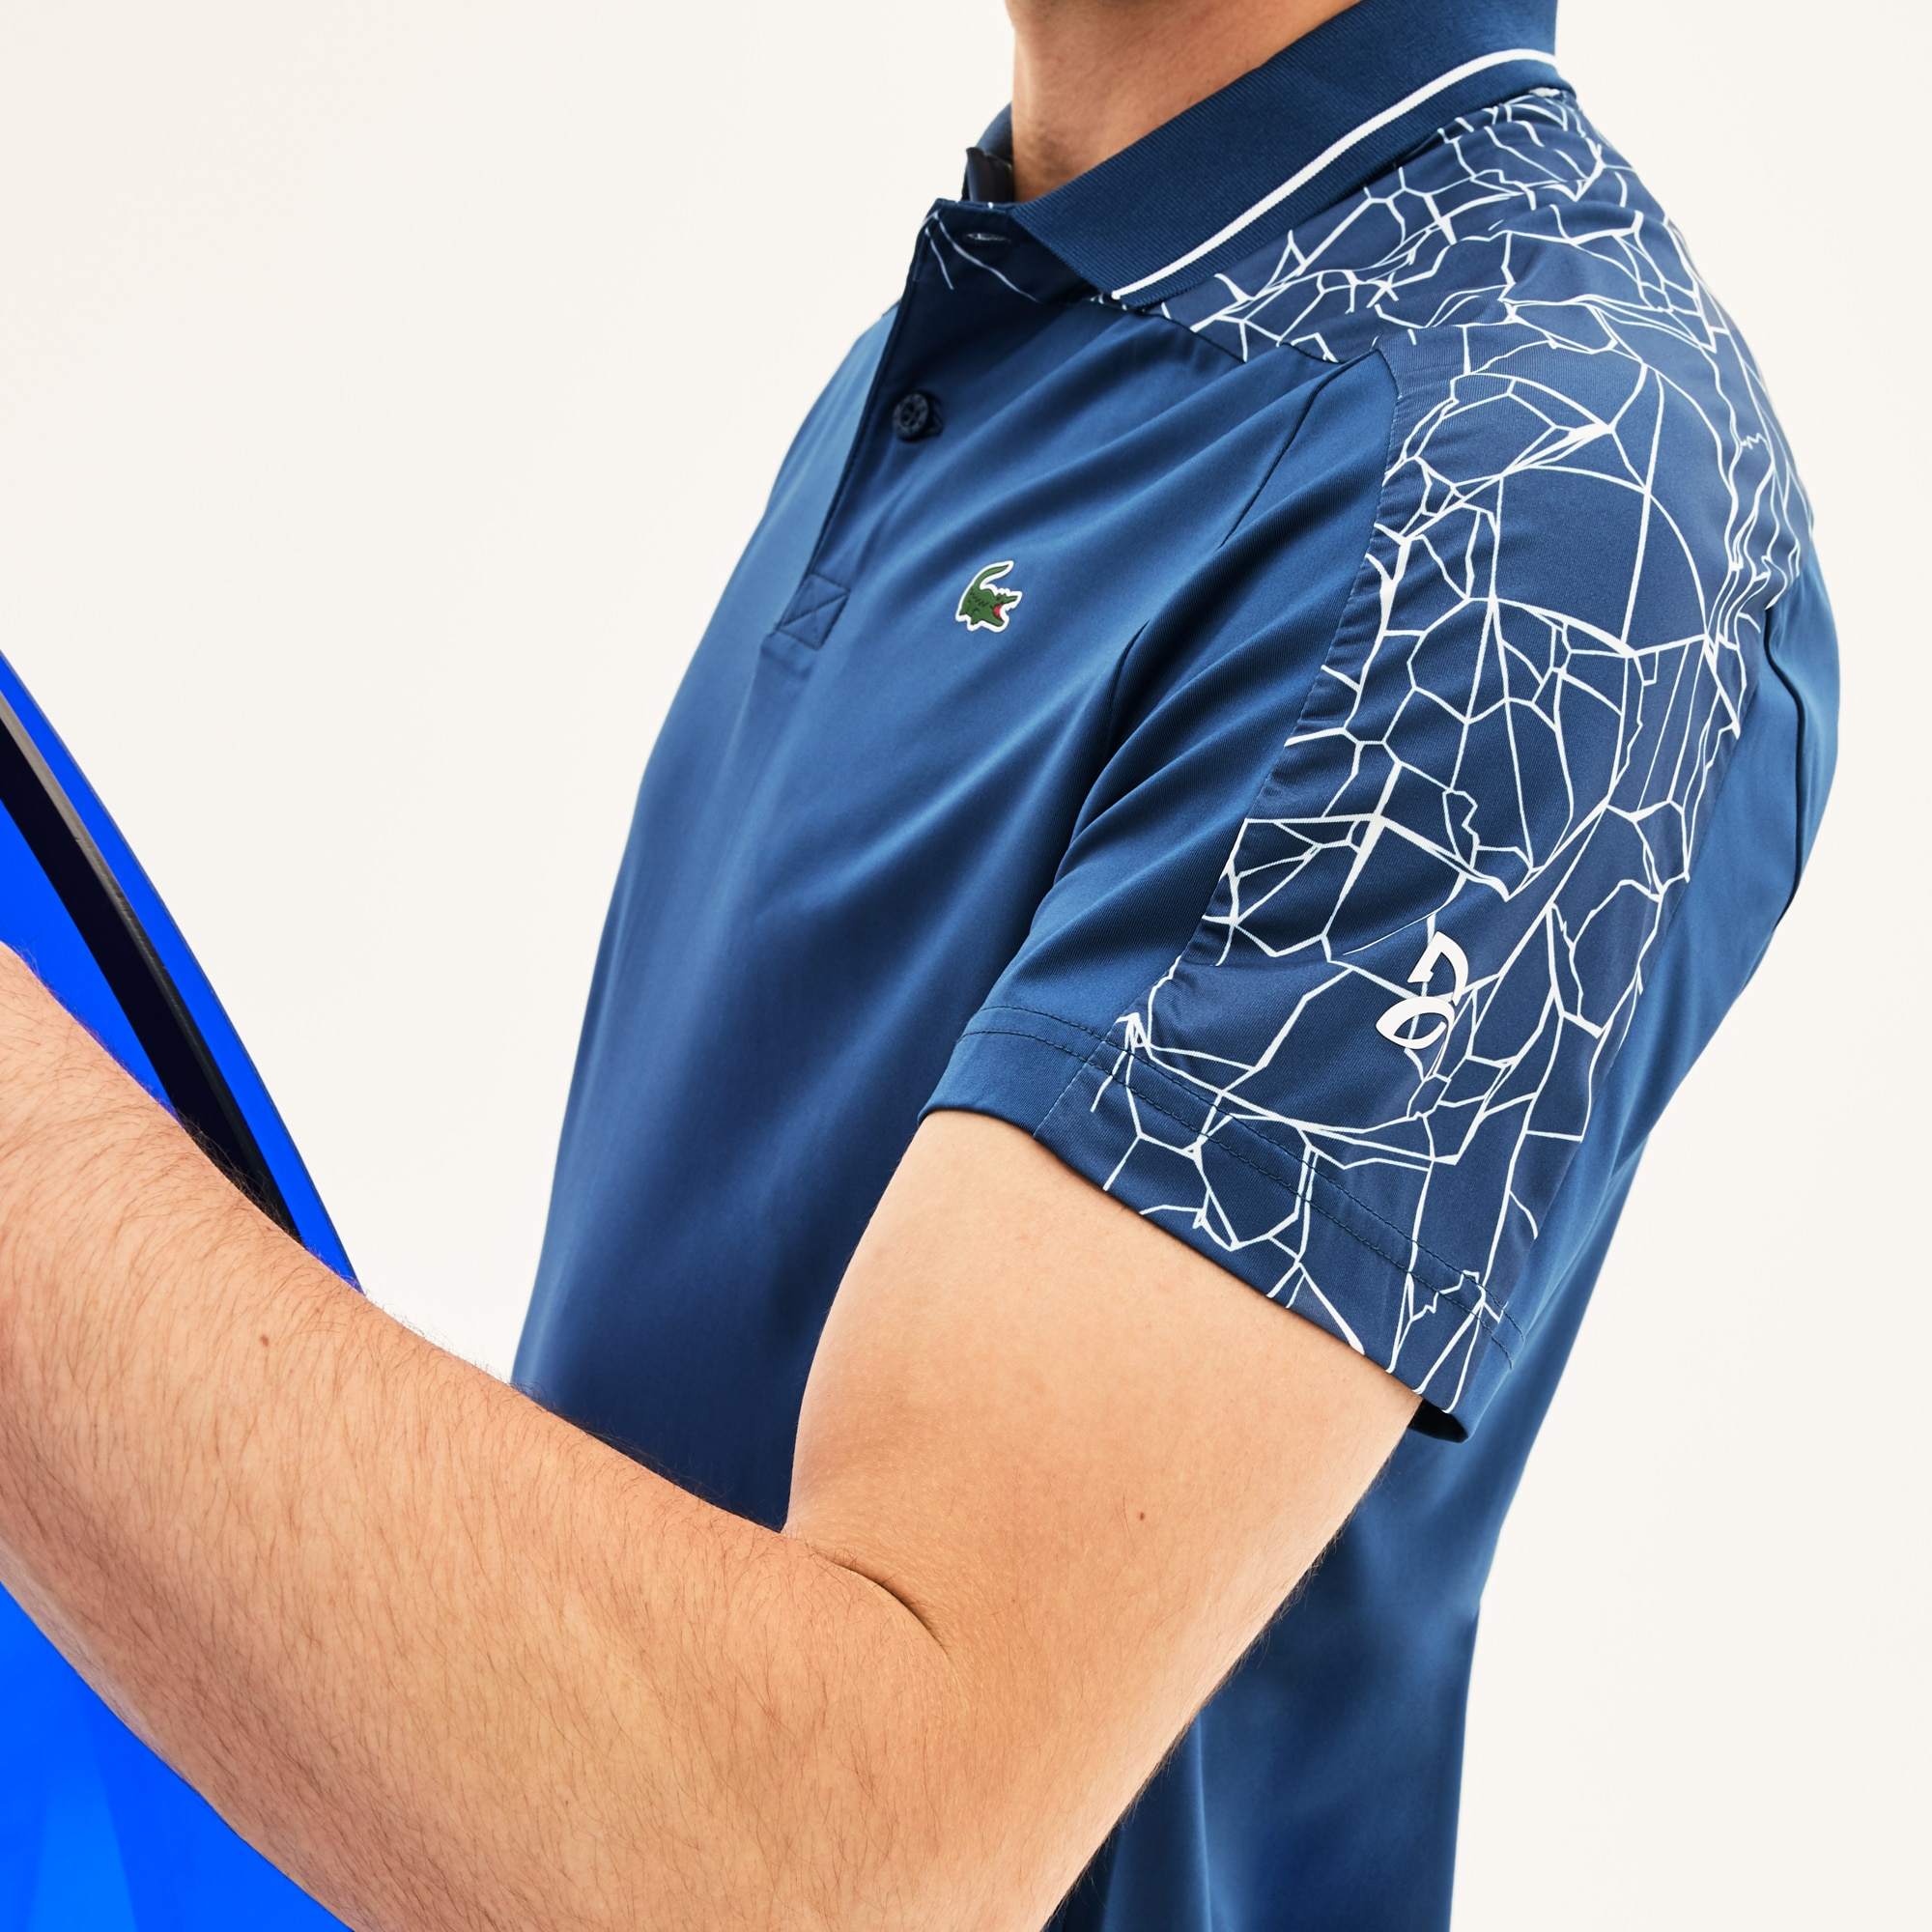 Lacoste - Herren-Poloshirt aus Stretch-Jersey LACOSTE SPORT NOVAK DJOKOVIC - 6